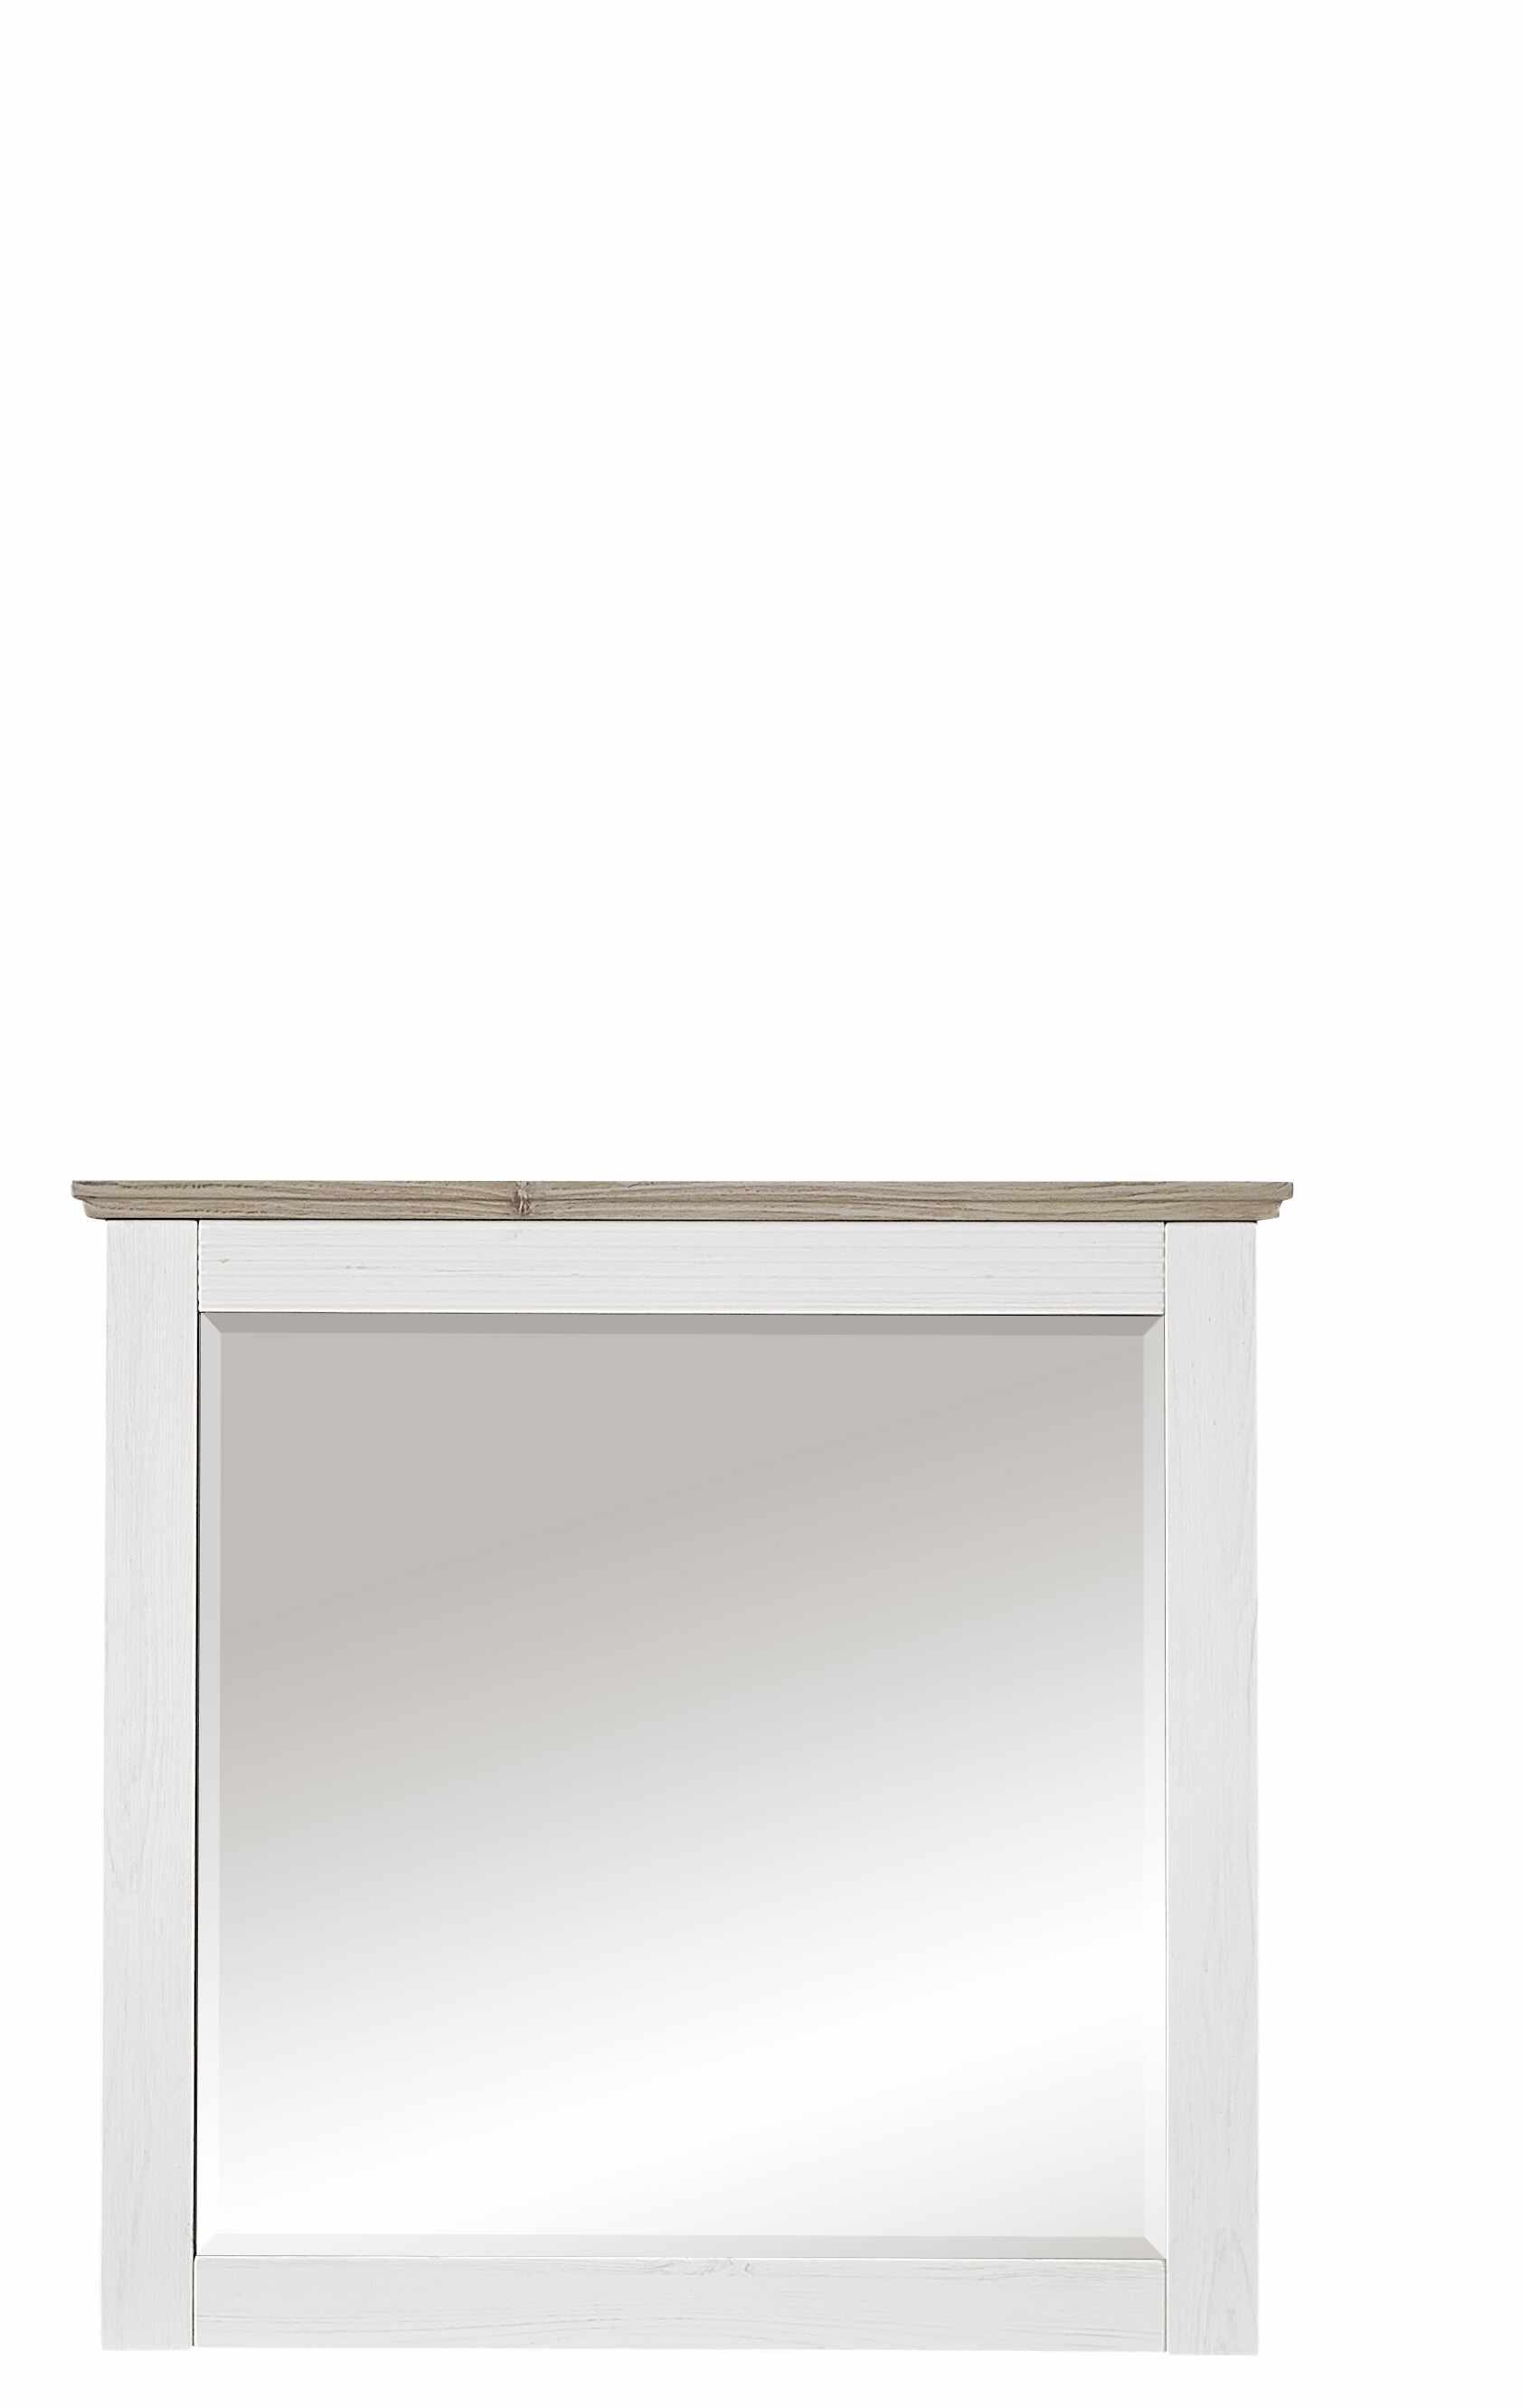 Oglinda din pal si MDF, Victory Alb, 89 x 85 cm la pret 495 lei